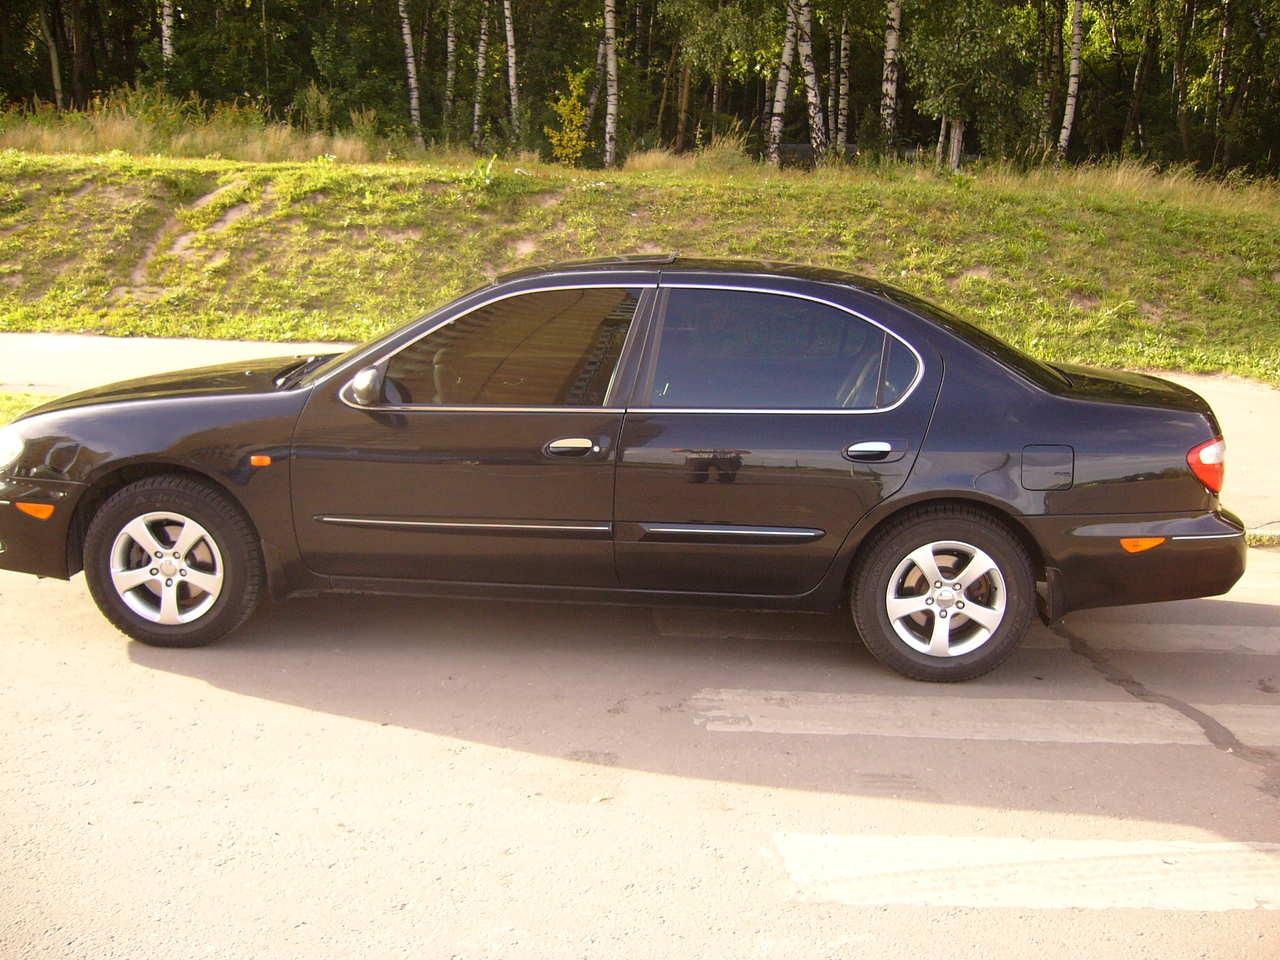 2003 Nissan Maxima Photos 2 0 Gasoline Ff Automatic